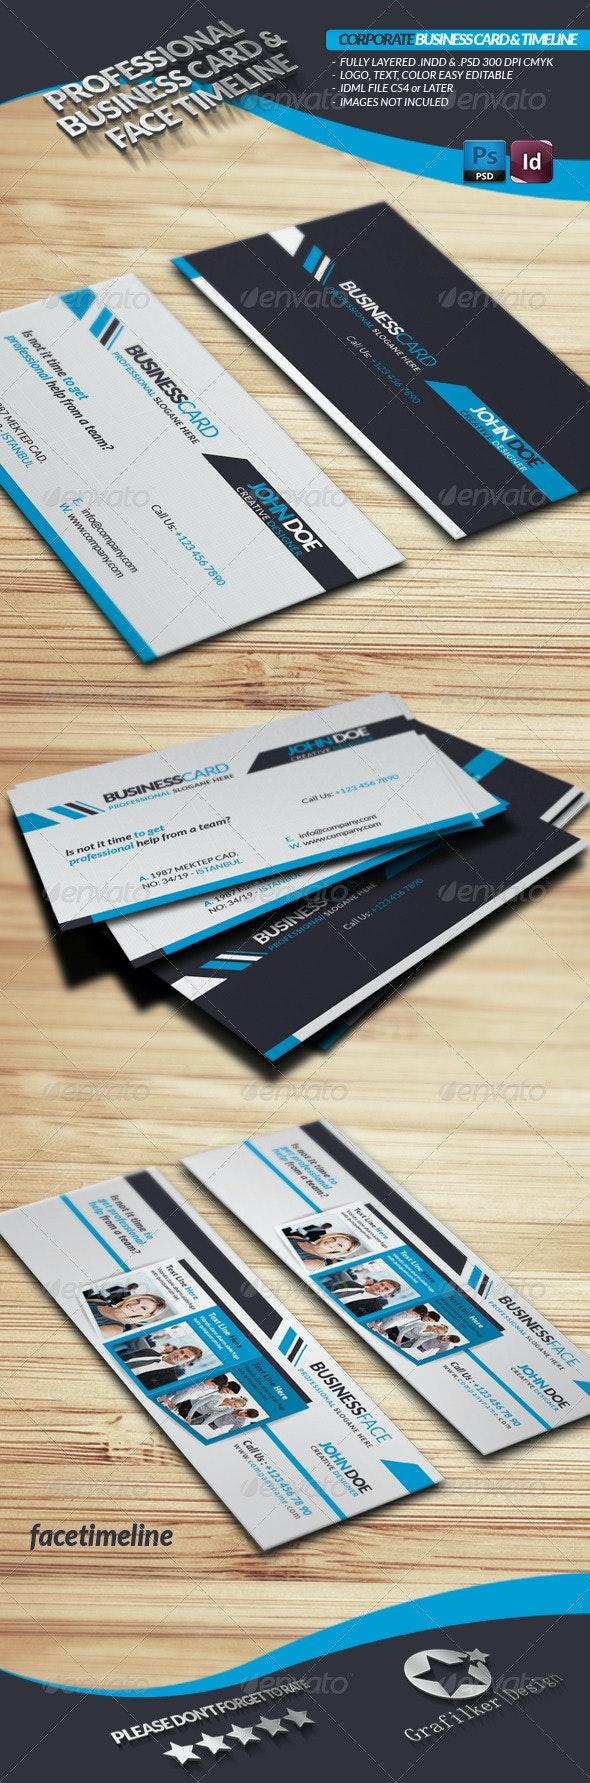 Corporate Business Card Face-Timeline - Corporate Business Cards